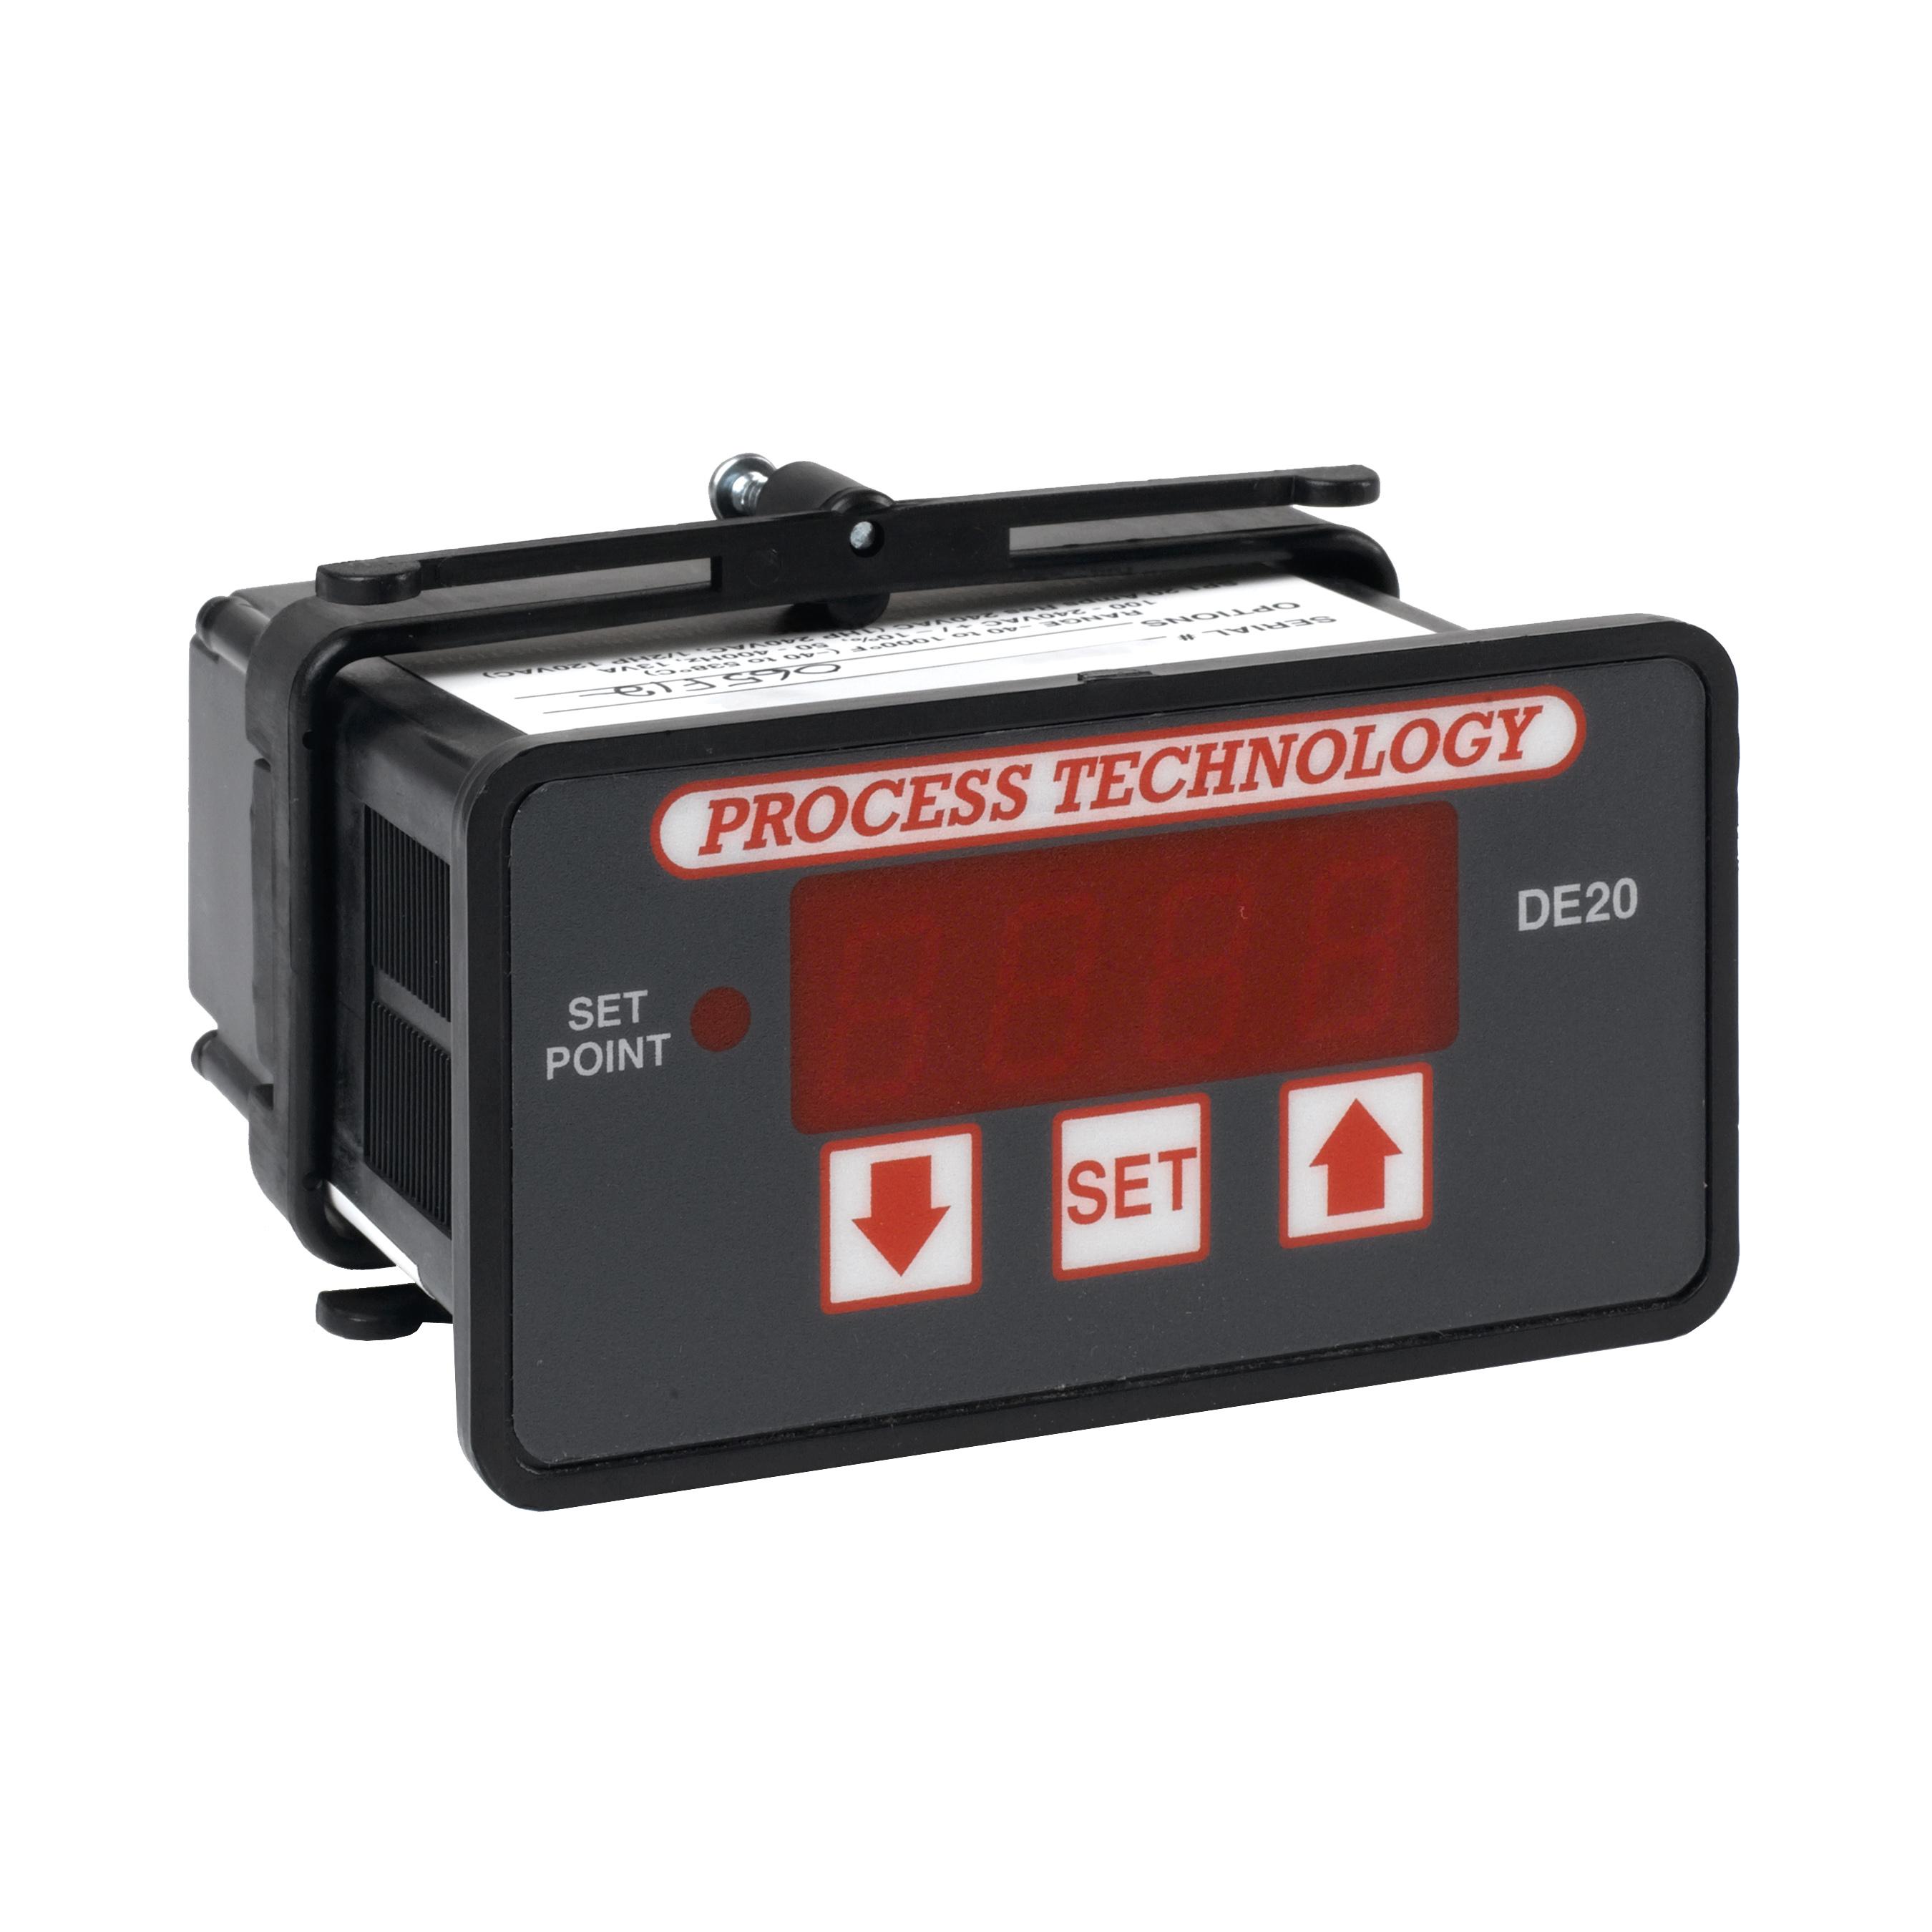 DE 20 Series Thermostat